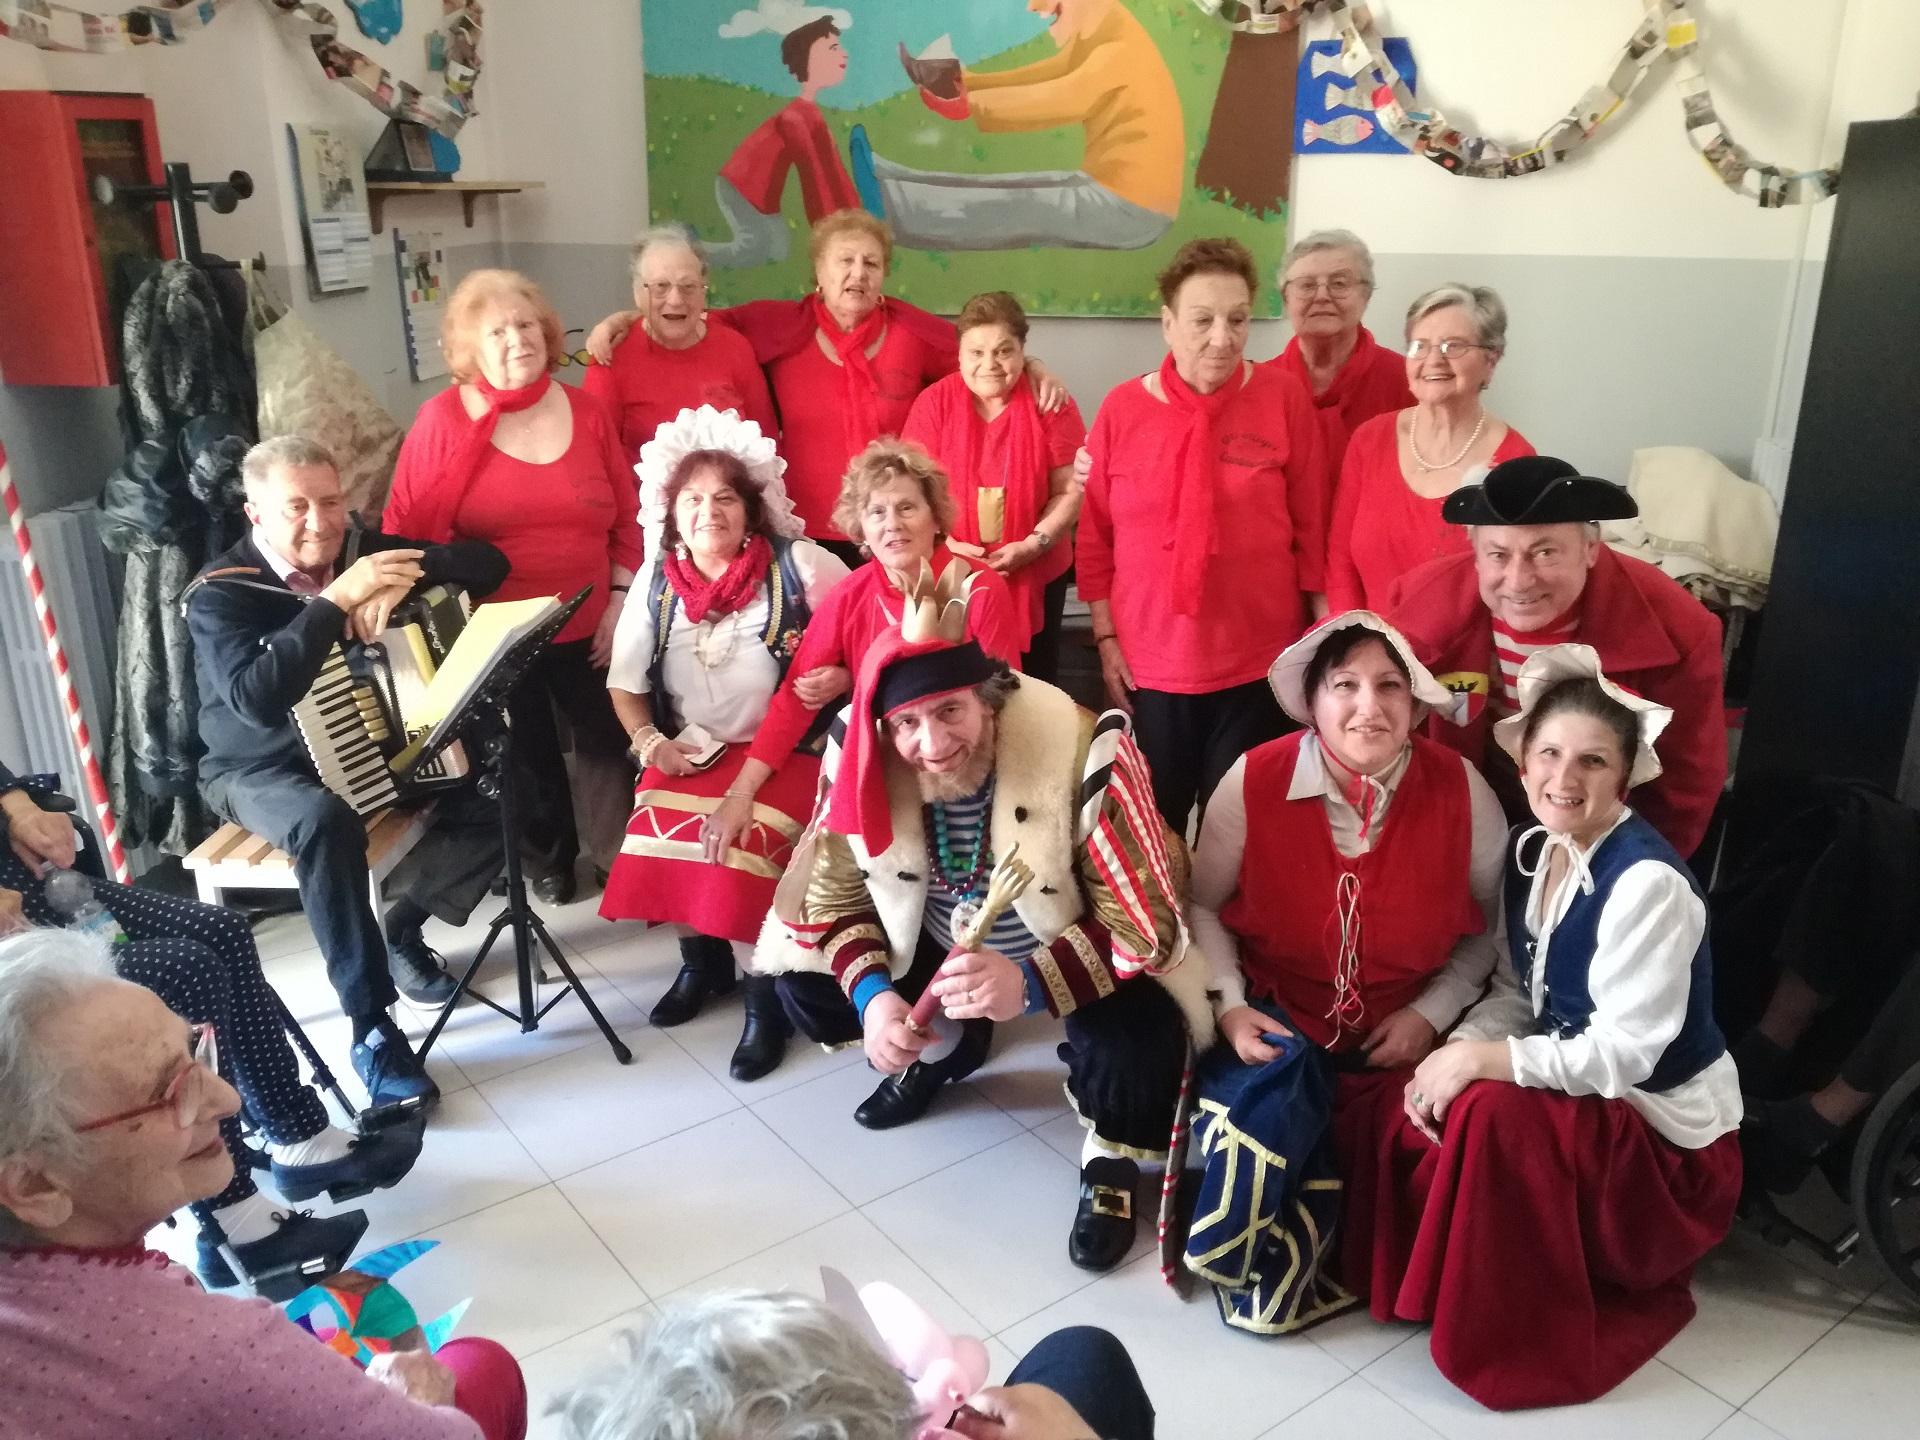 Festa Carnevale RSA Noceti - Opere Sociali Servizi Savona